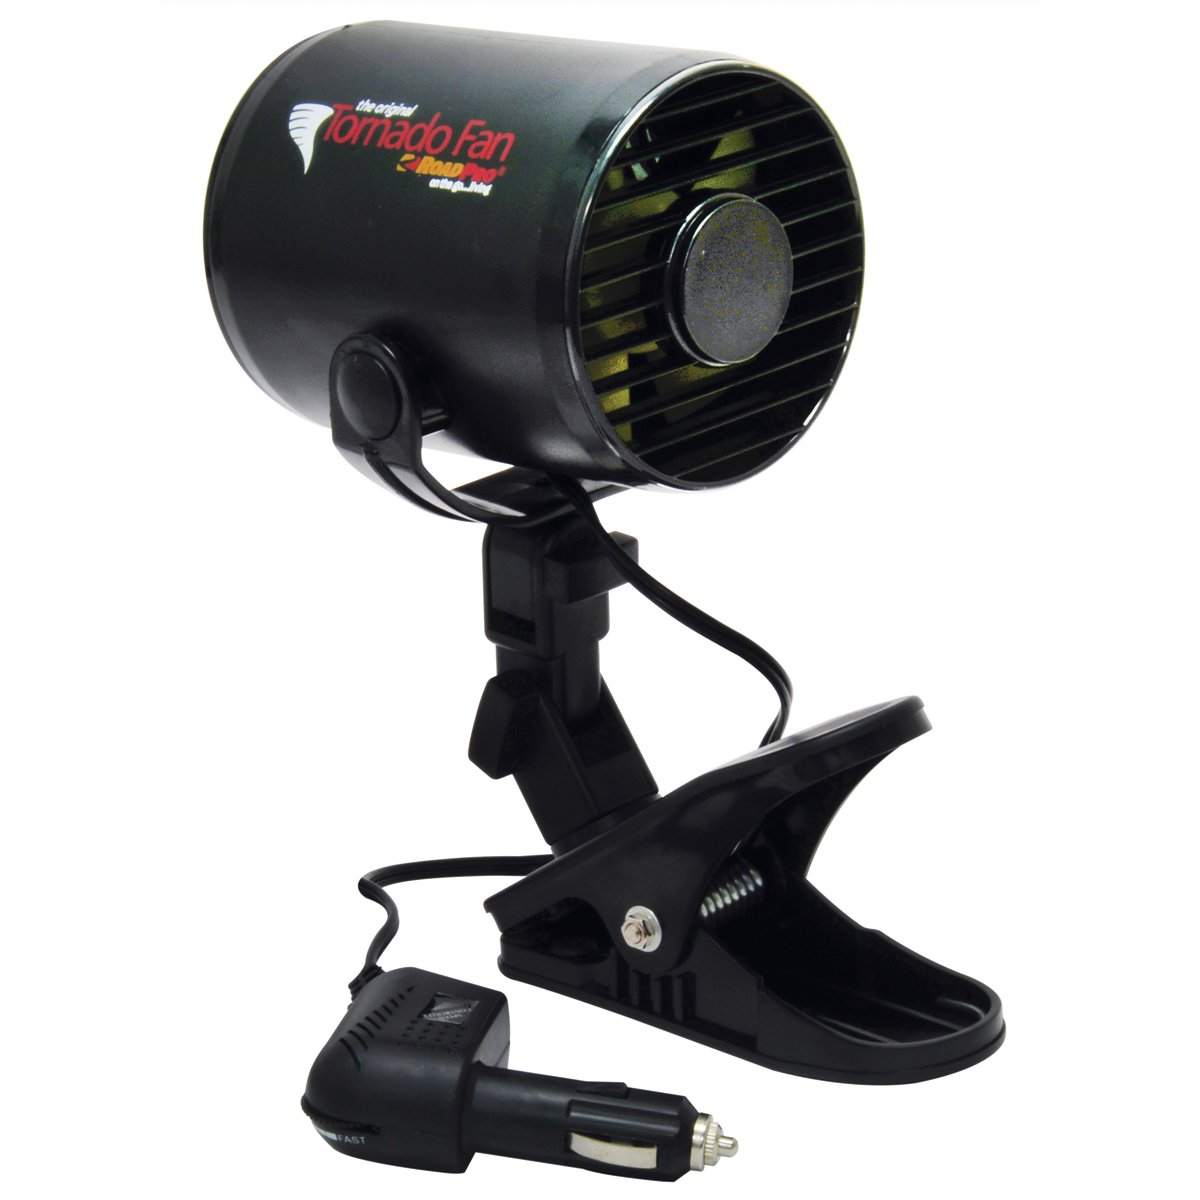 Roadpro Rpsc-857 12-volt Tornado Fan With Removable Mount...